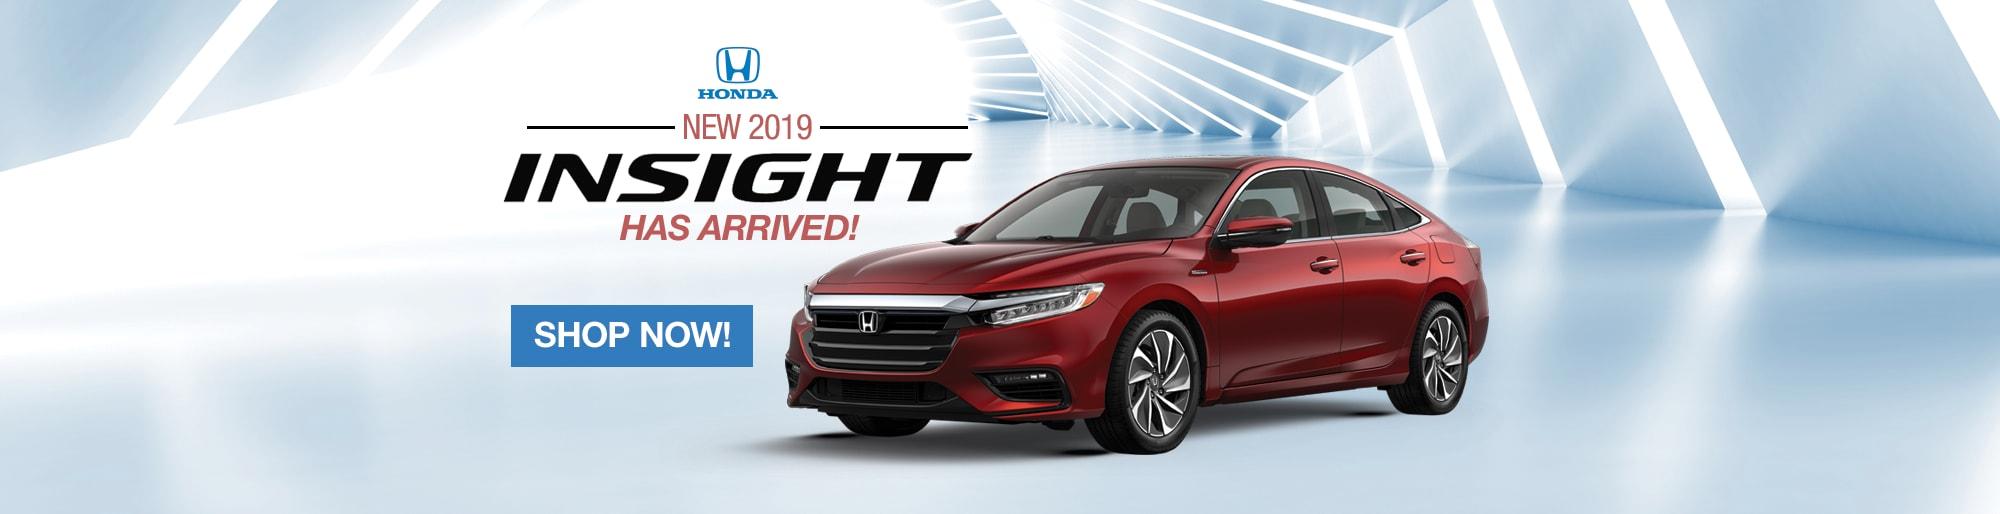 New & Used Honda Cars, Trucks & SUVs | College Park Honda